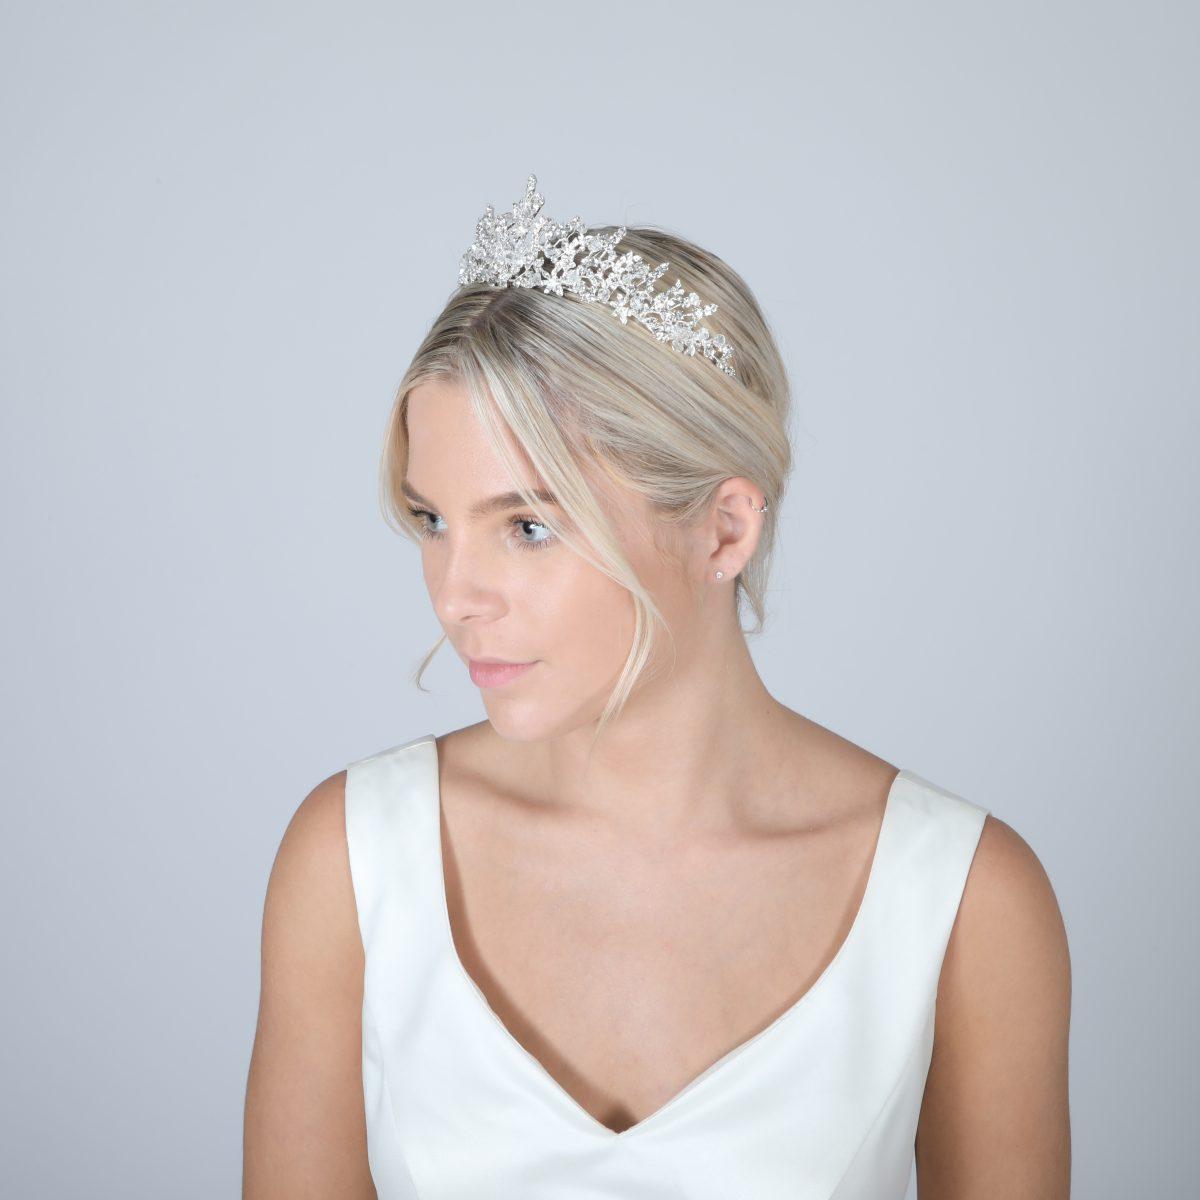 Perfect Bridal Tiara - PBT5027 2